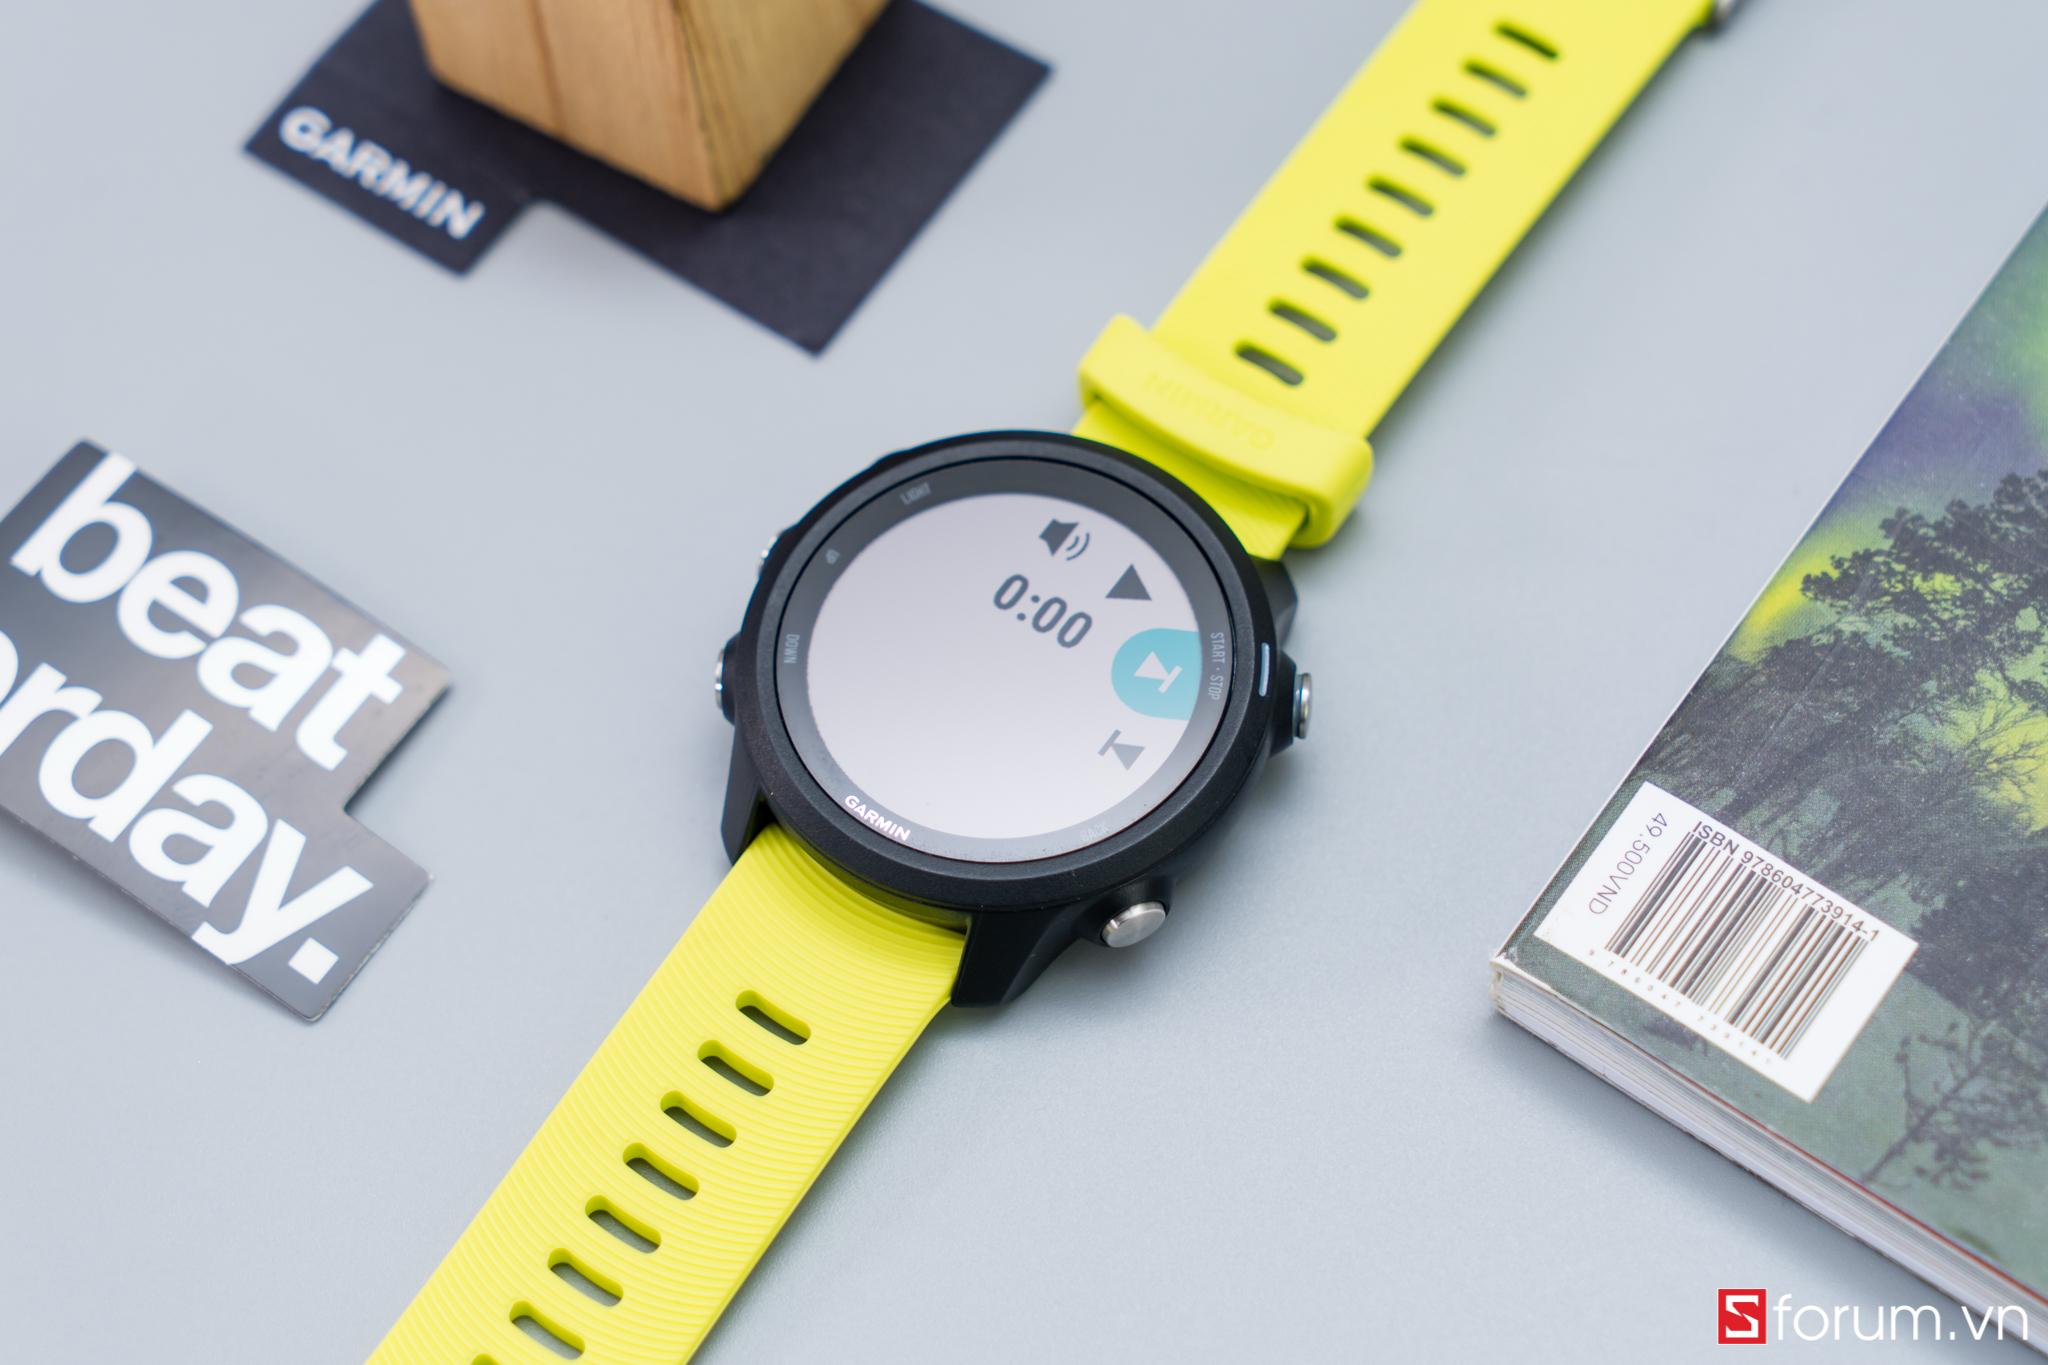 Sforum - Latest technology information page CPS-Garmin-Forerunner-245-28 Reviews Garmin Forerunner 245: Smartwatch